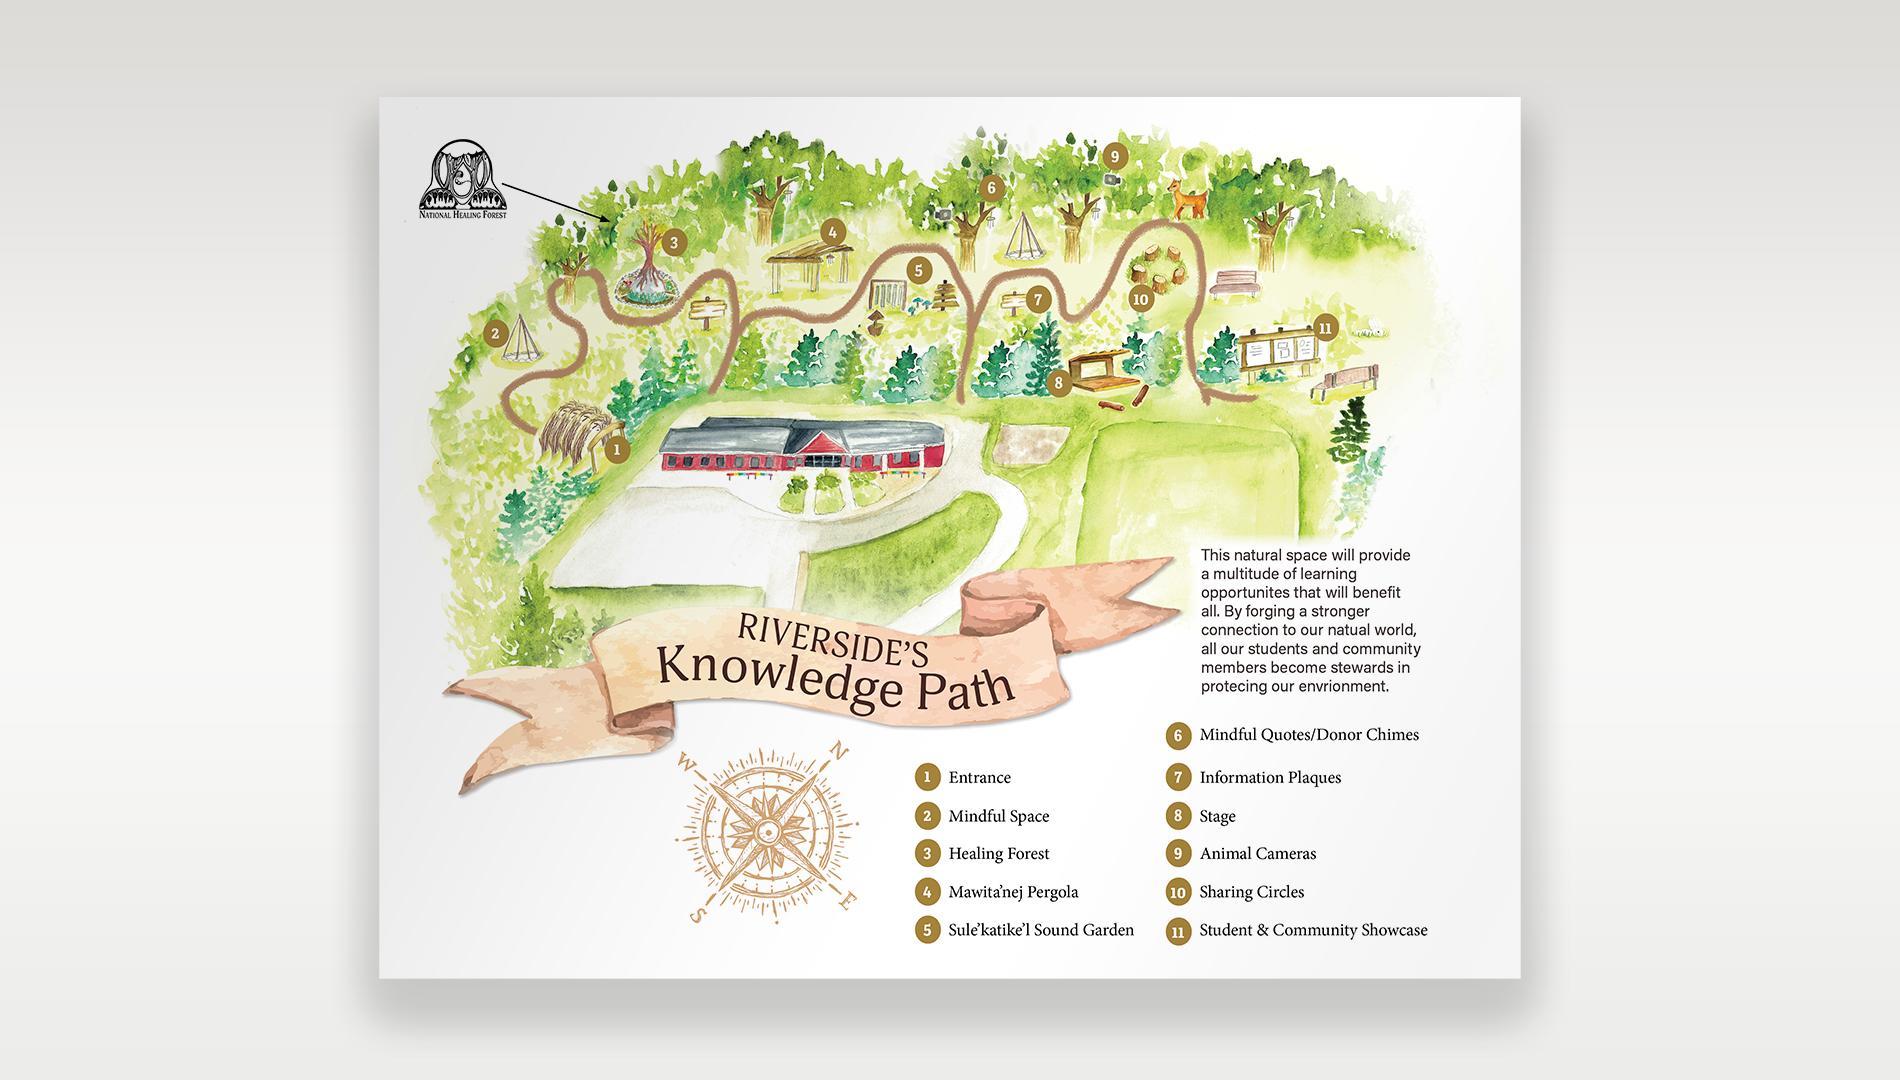 AnchoredIdeas-Portfolio-PrintBrochure-KnowledgeKeepersPath-2